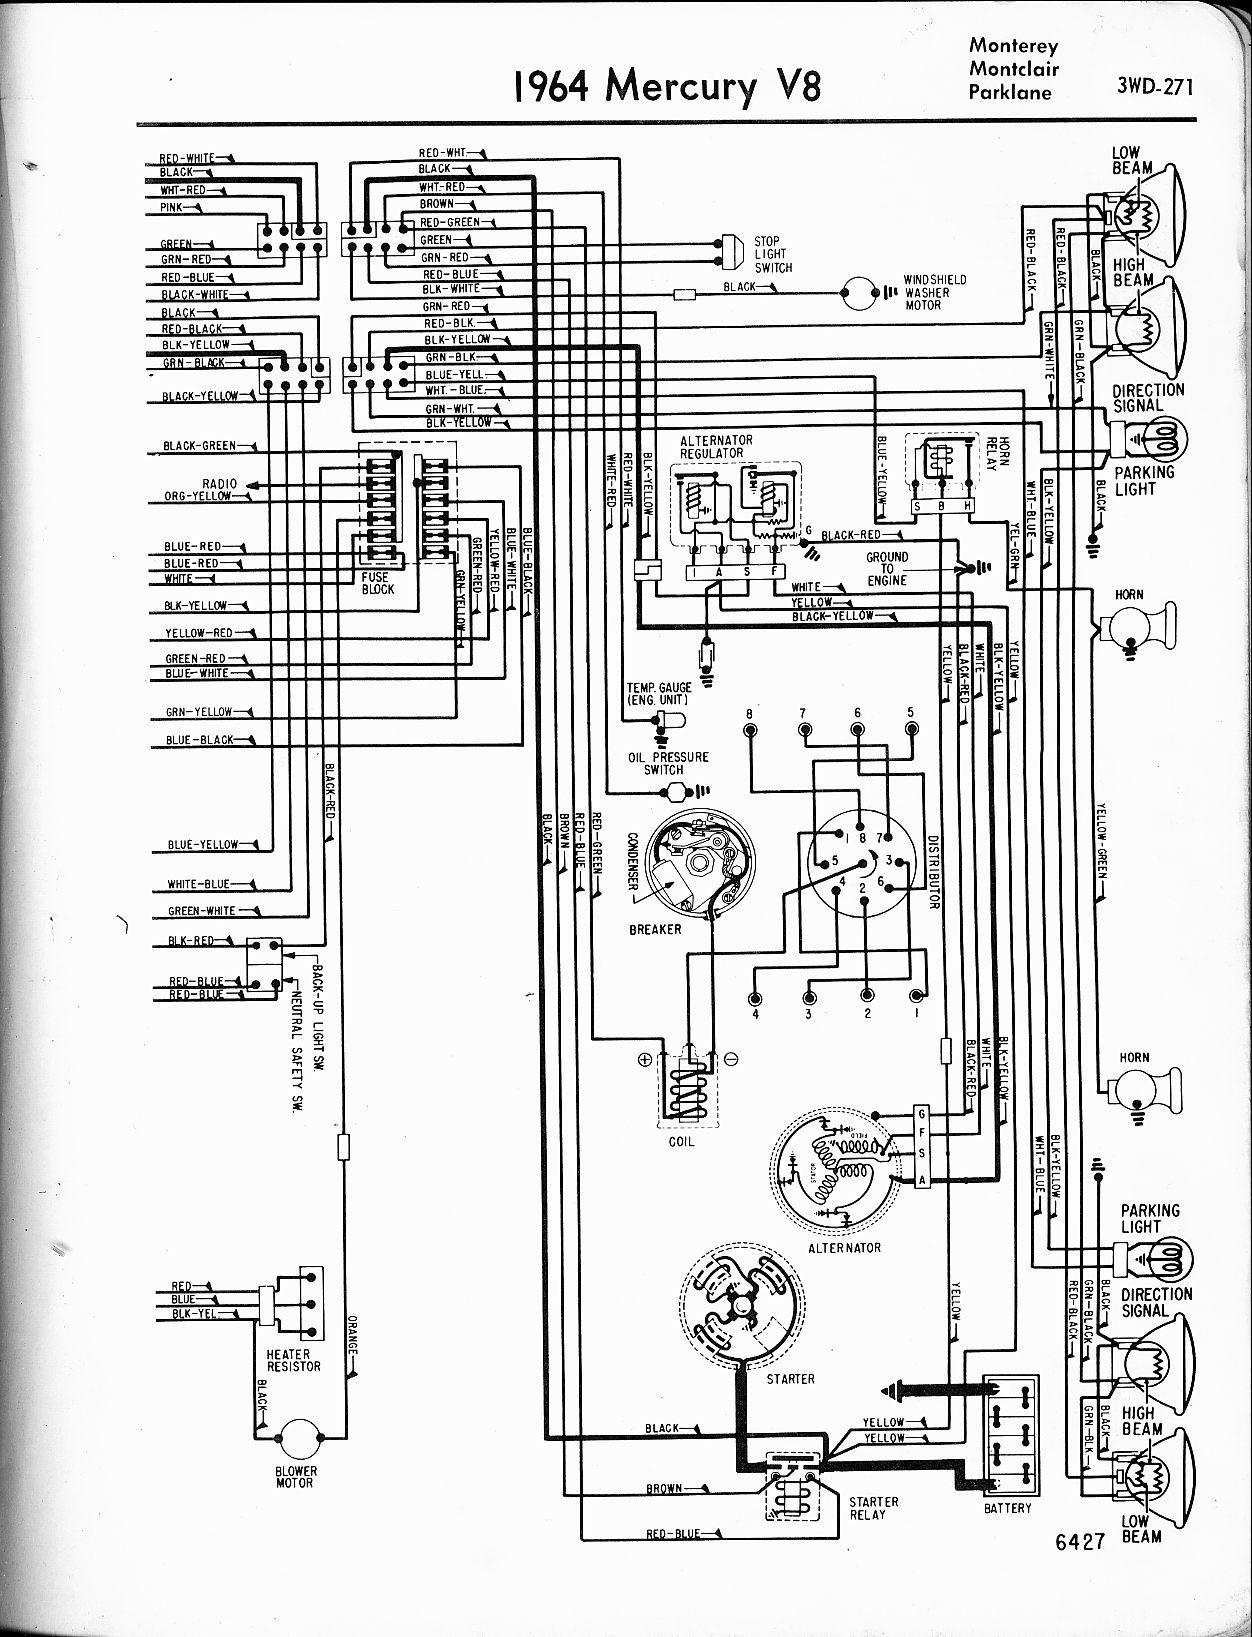 mercury wiring harness diagram ez go for golf cart 1966 montclair get free image